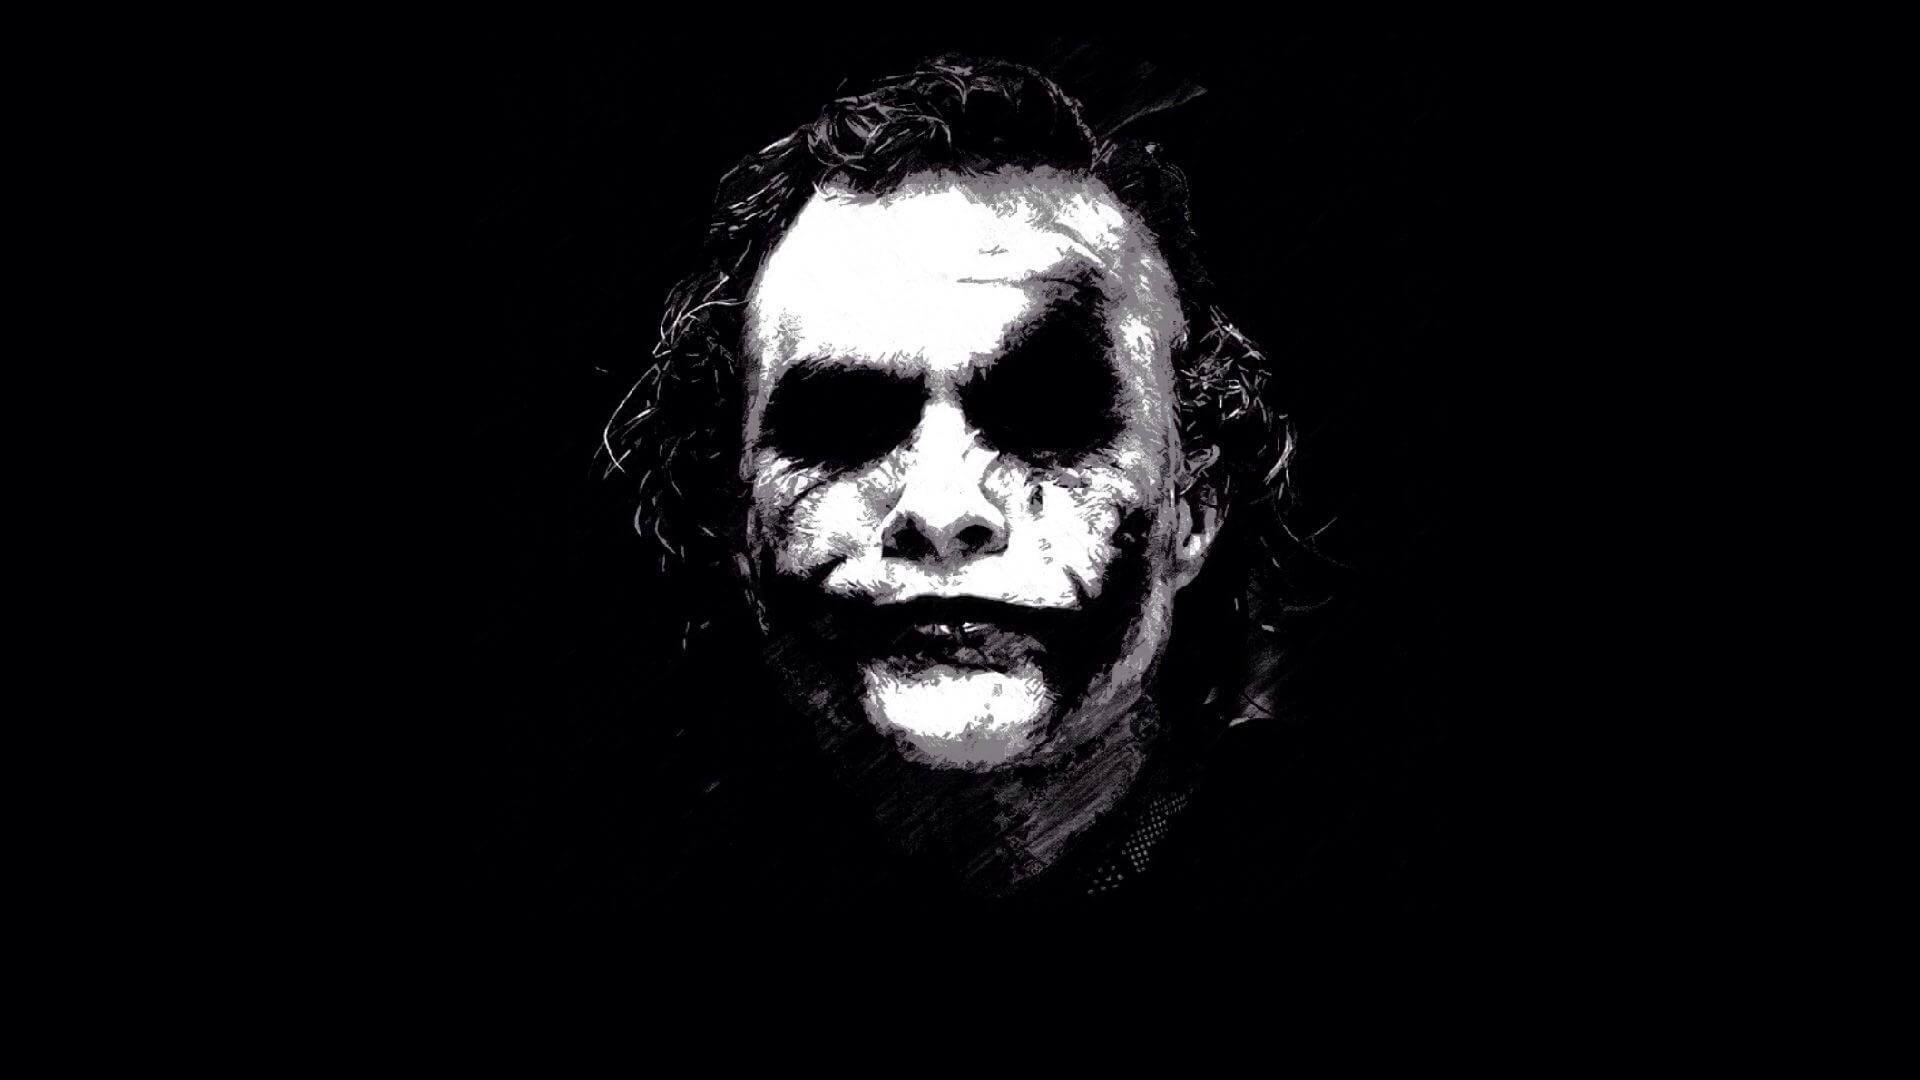 High definition image of Joker black and white logo